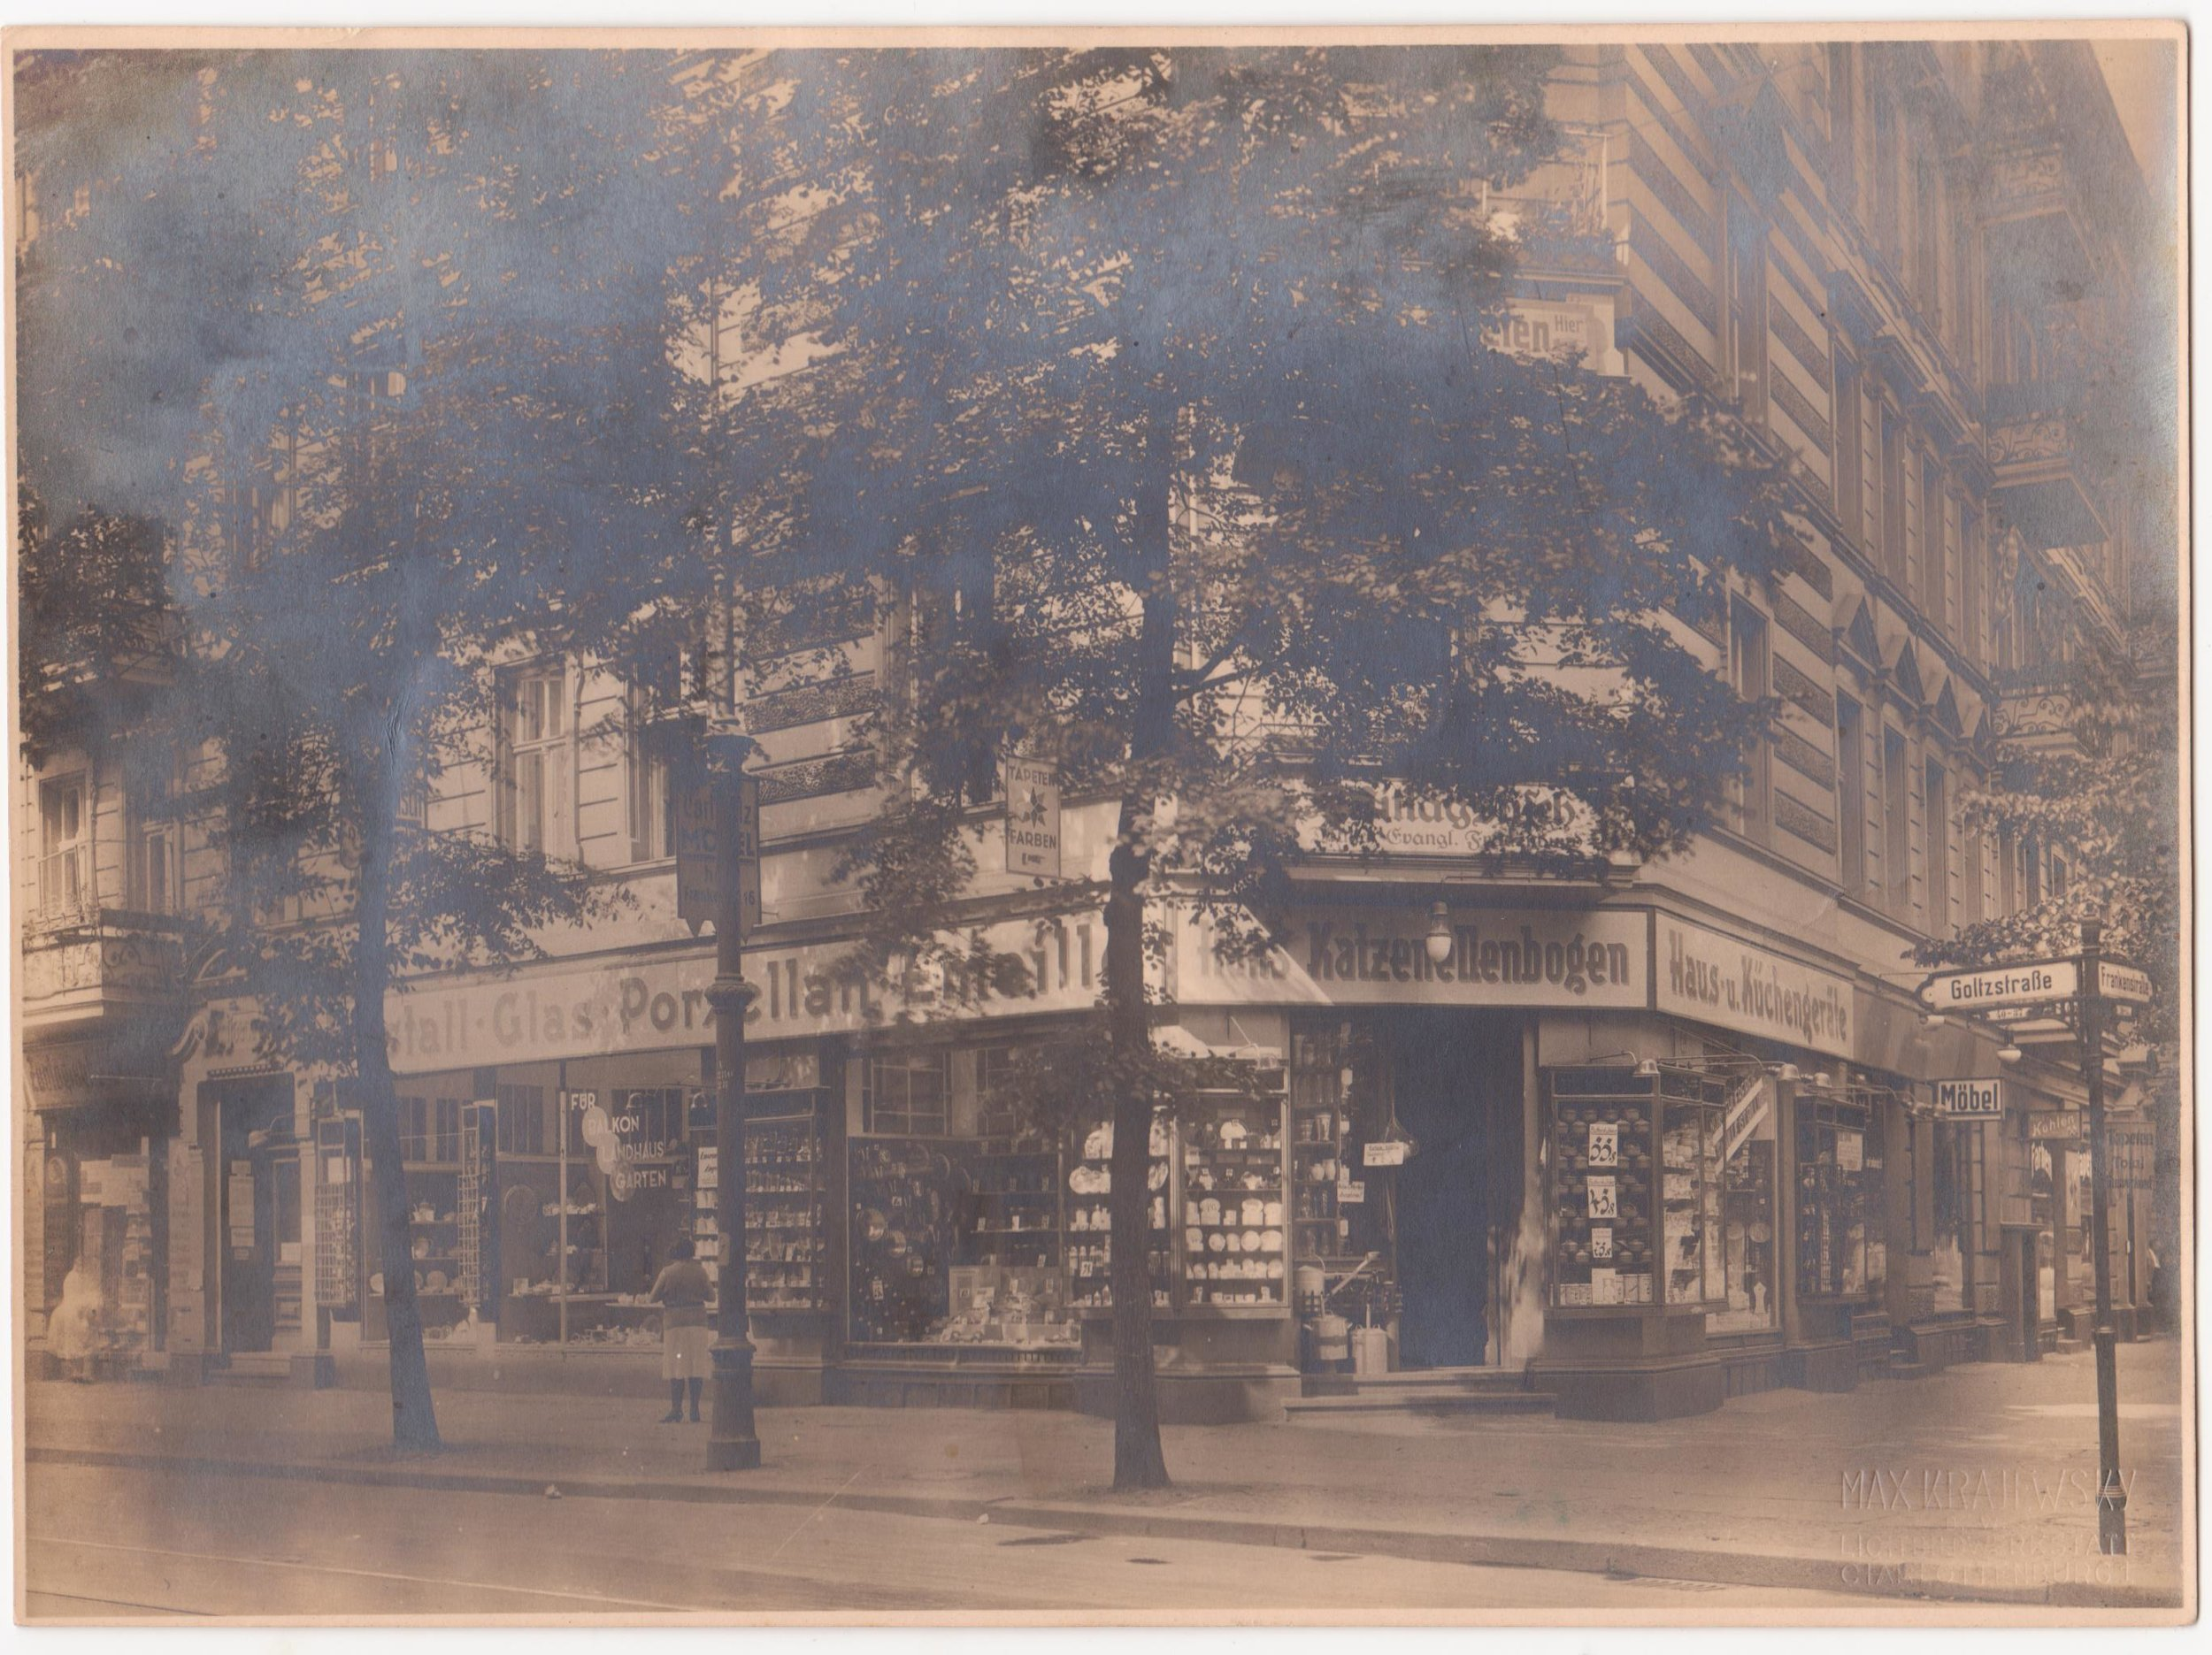 Hans Katzenellenbogen's shop selling porcelain and glassware in Goltzstrasse, Berlin, 1931 @Katzenellenbogen family